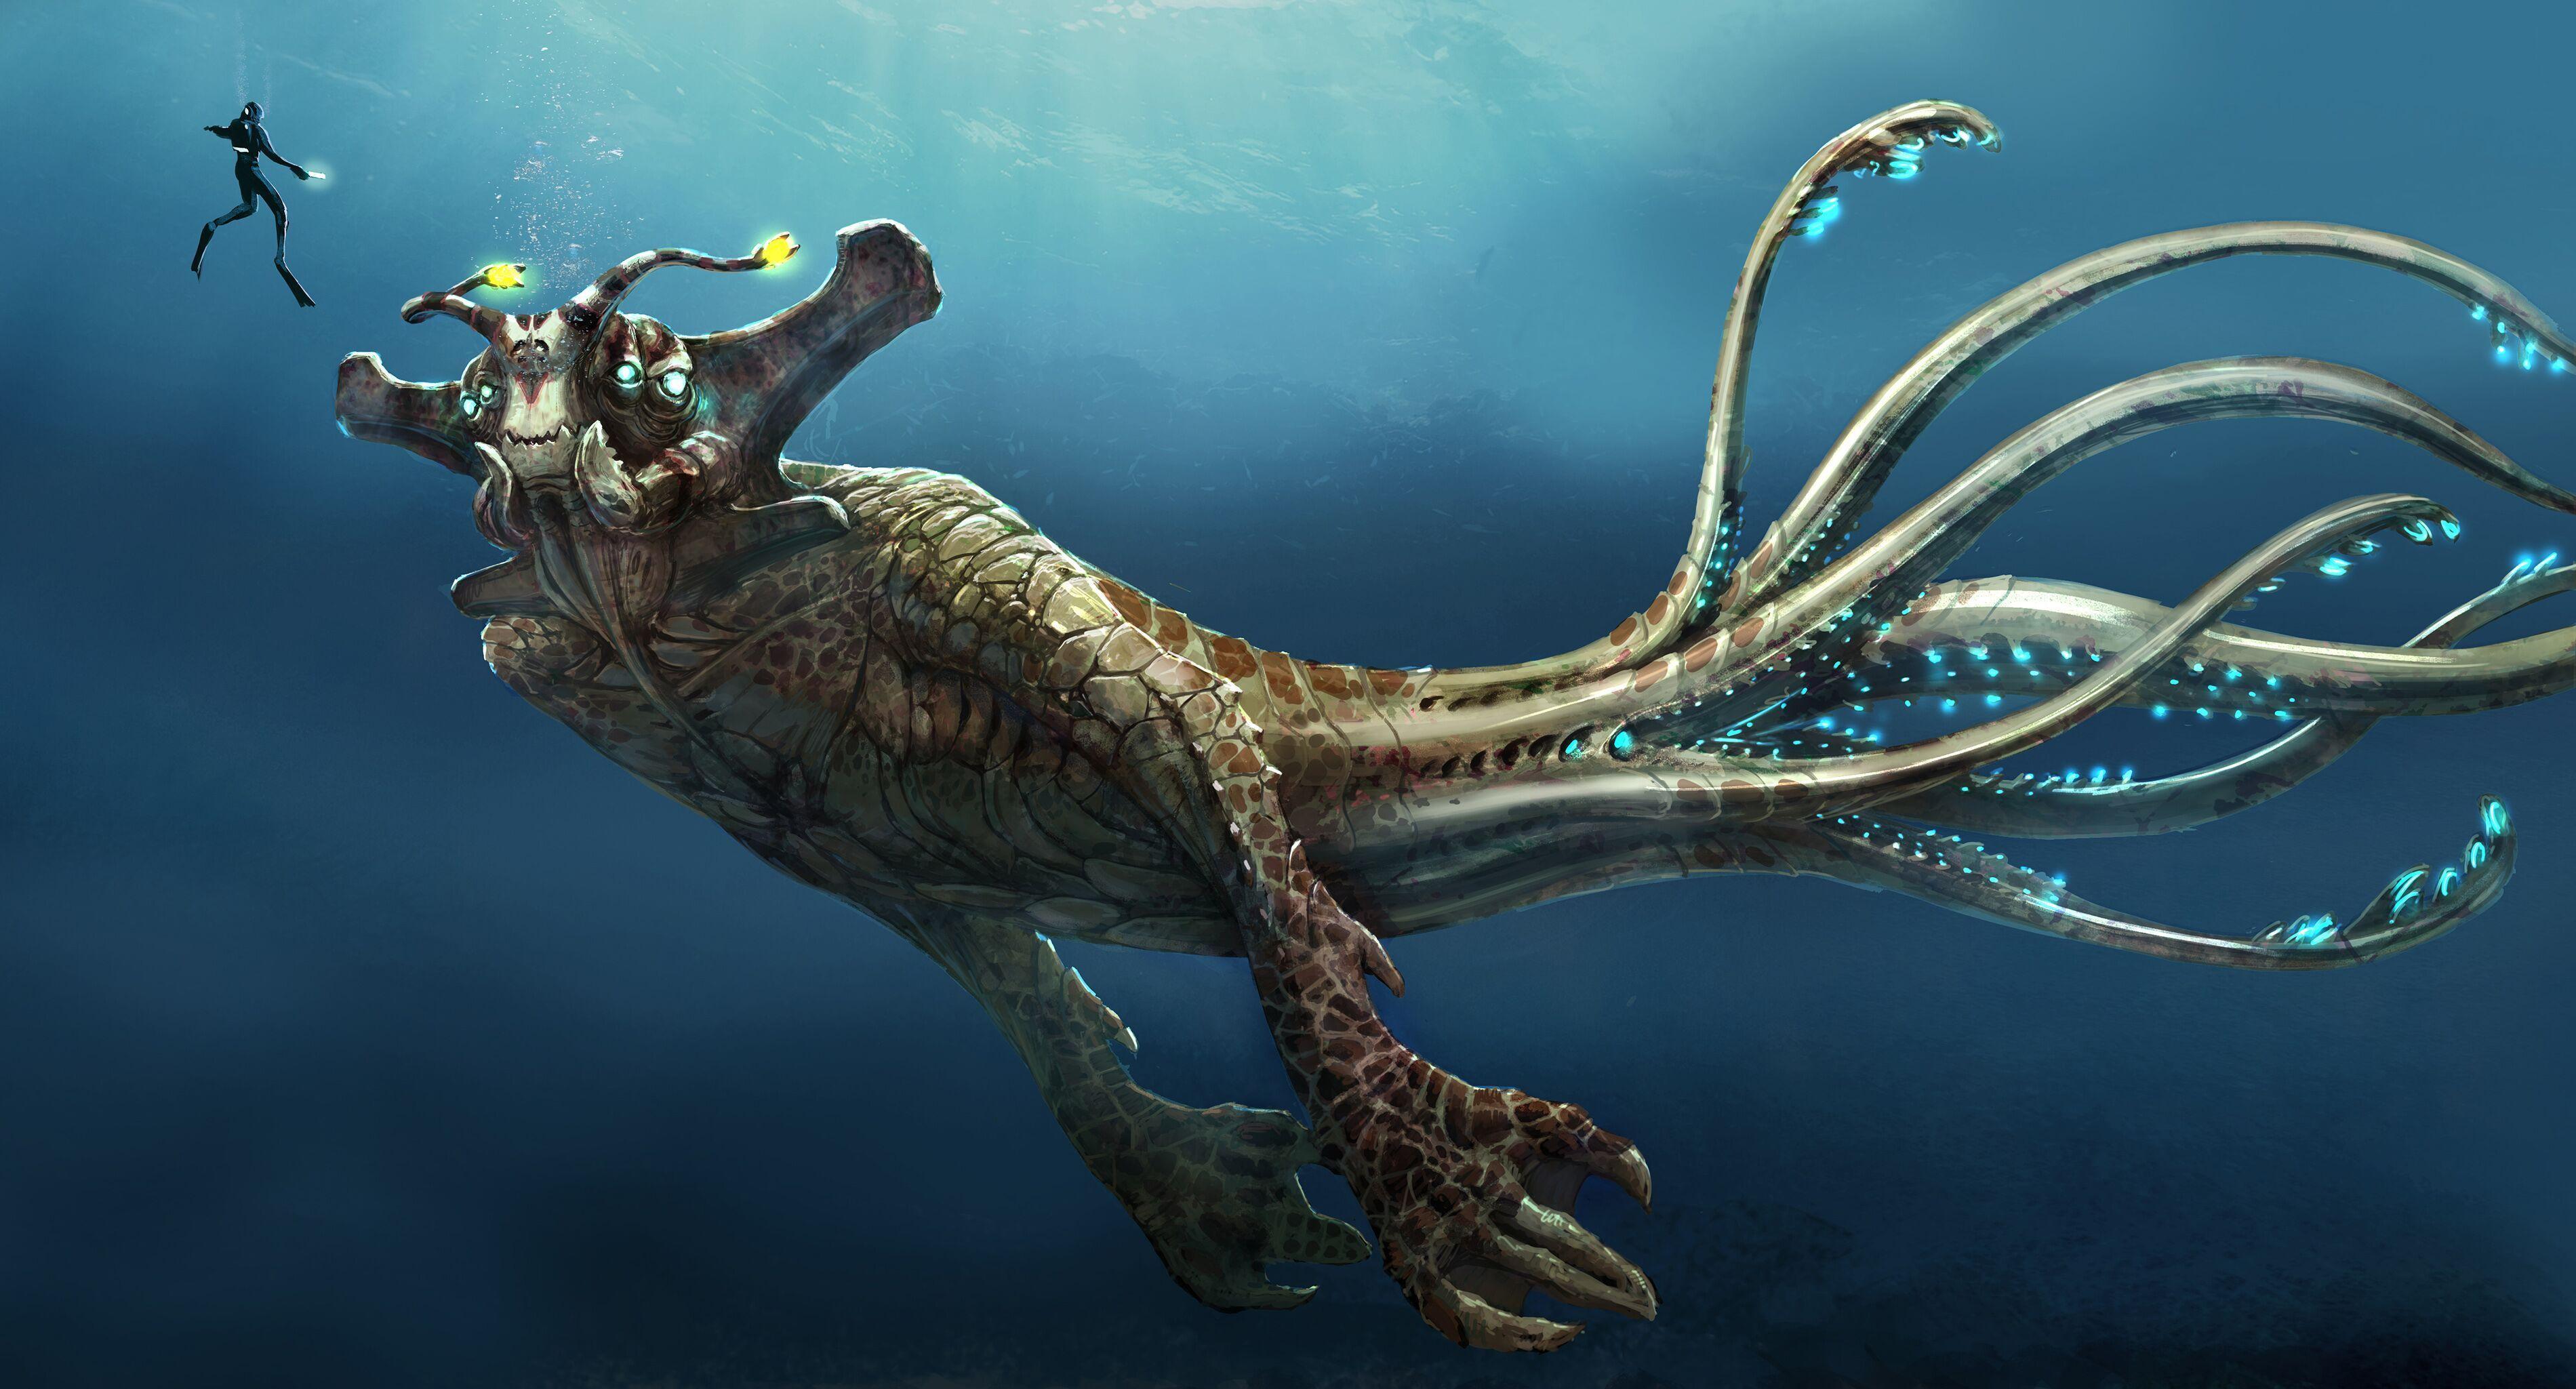 Sea Emperor Leviathan Wallpapers - Top